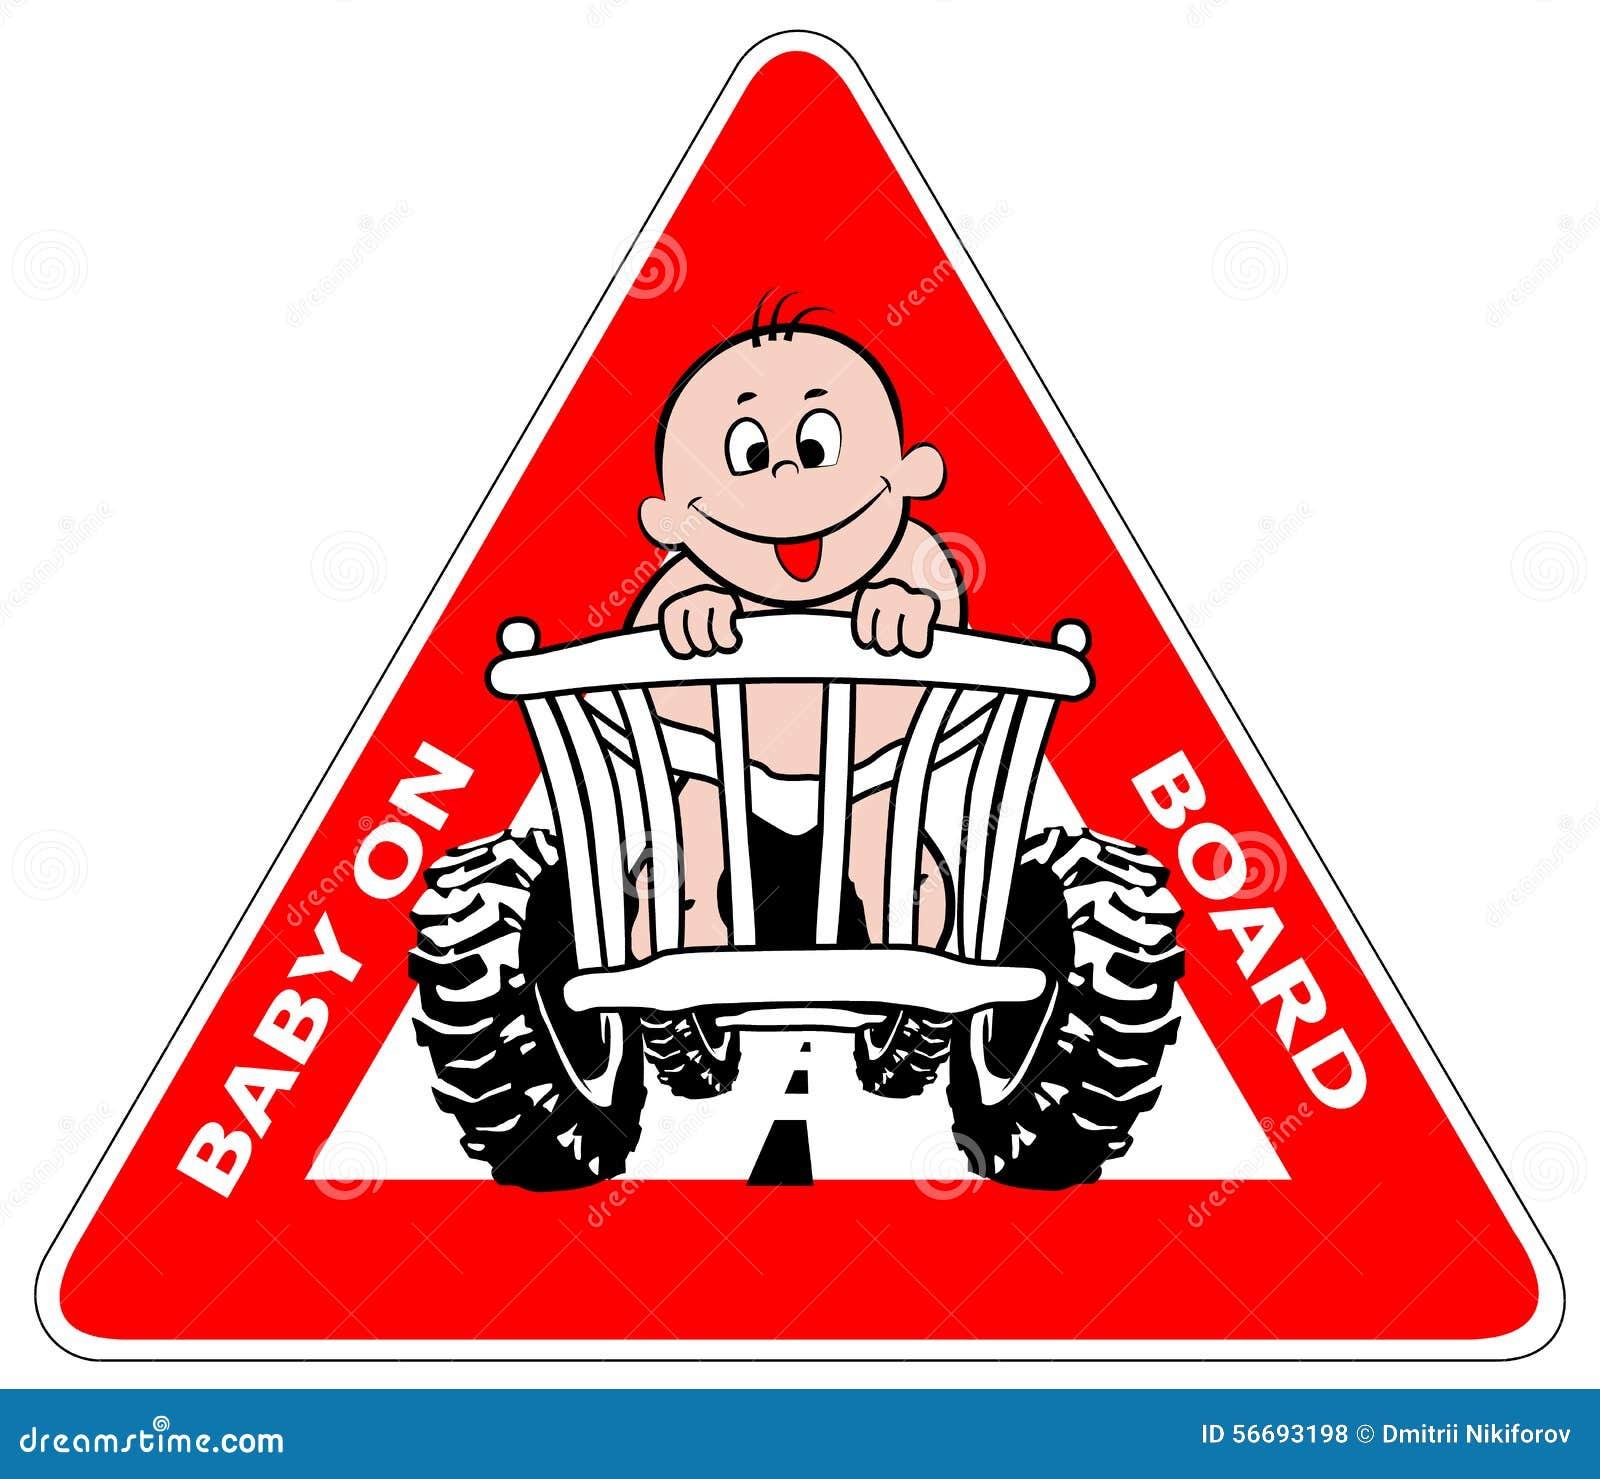 Baby on board sticker on car vector illustration